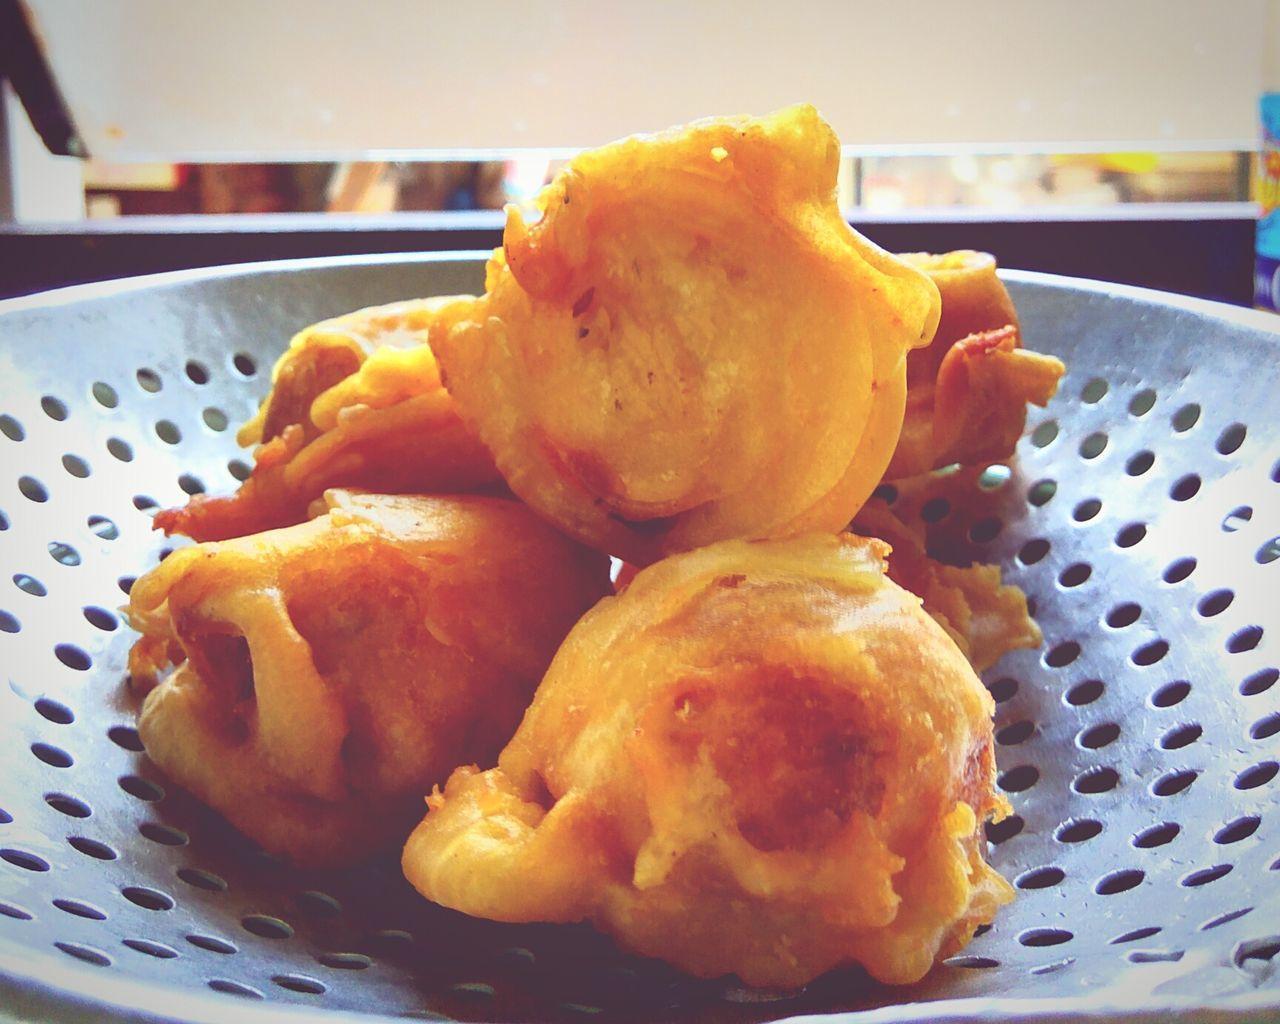 Deep Fried  CRYSPY Cempedak Asian  Fruit Jack Fruit Oily Dessert Food Yellow Skin Heaty